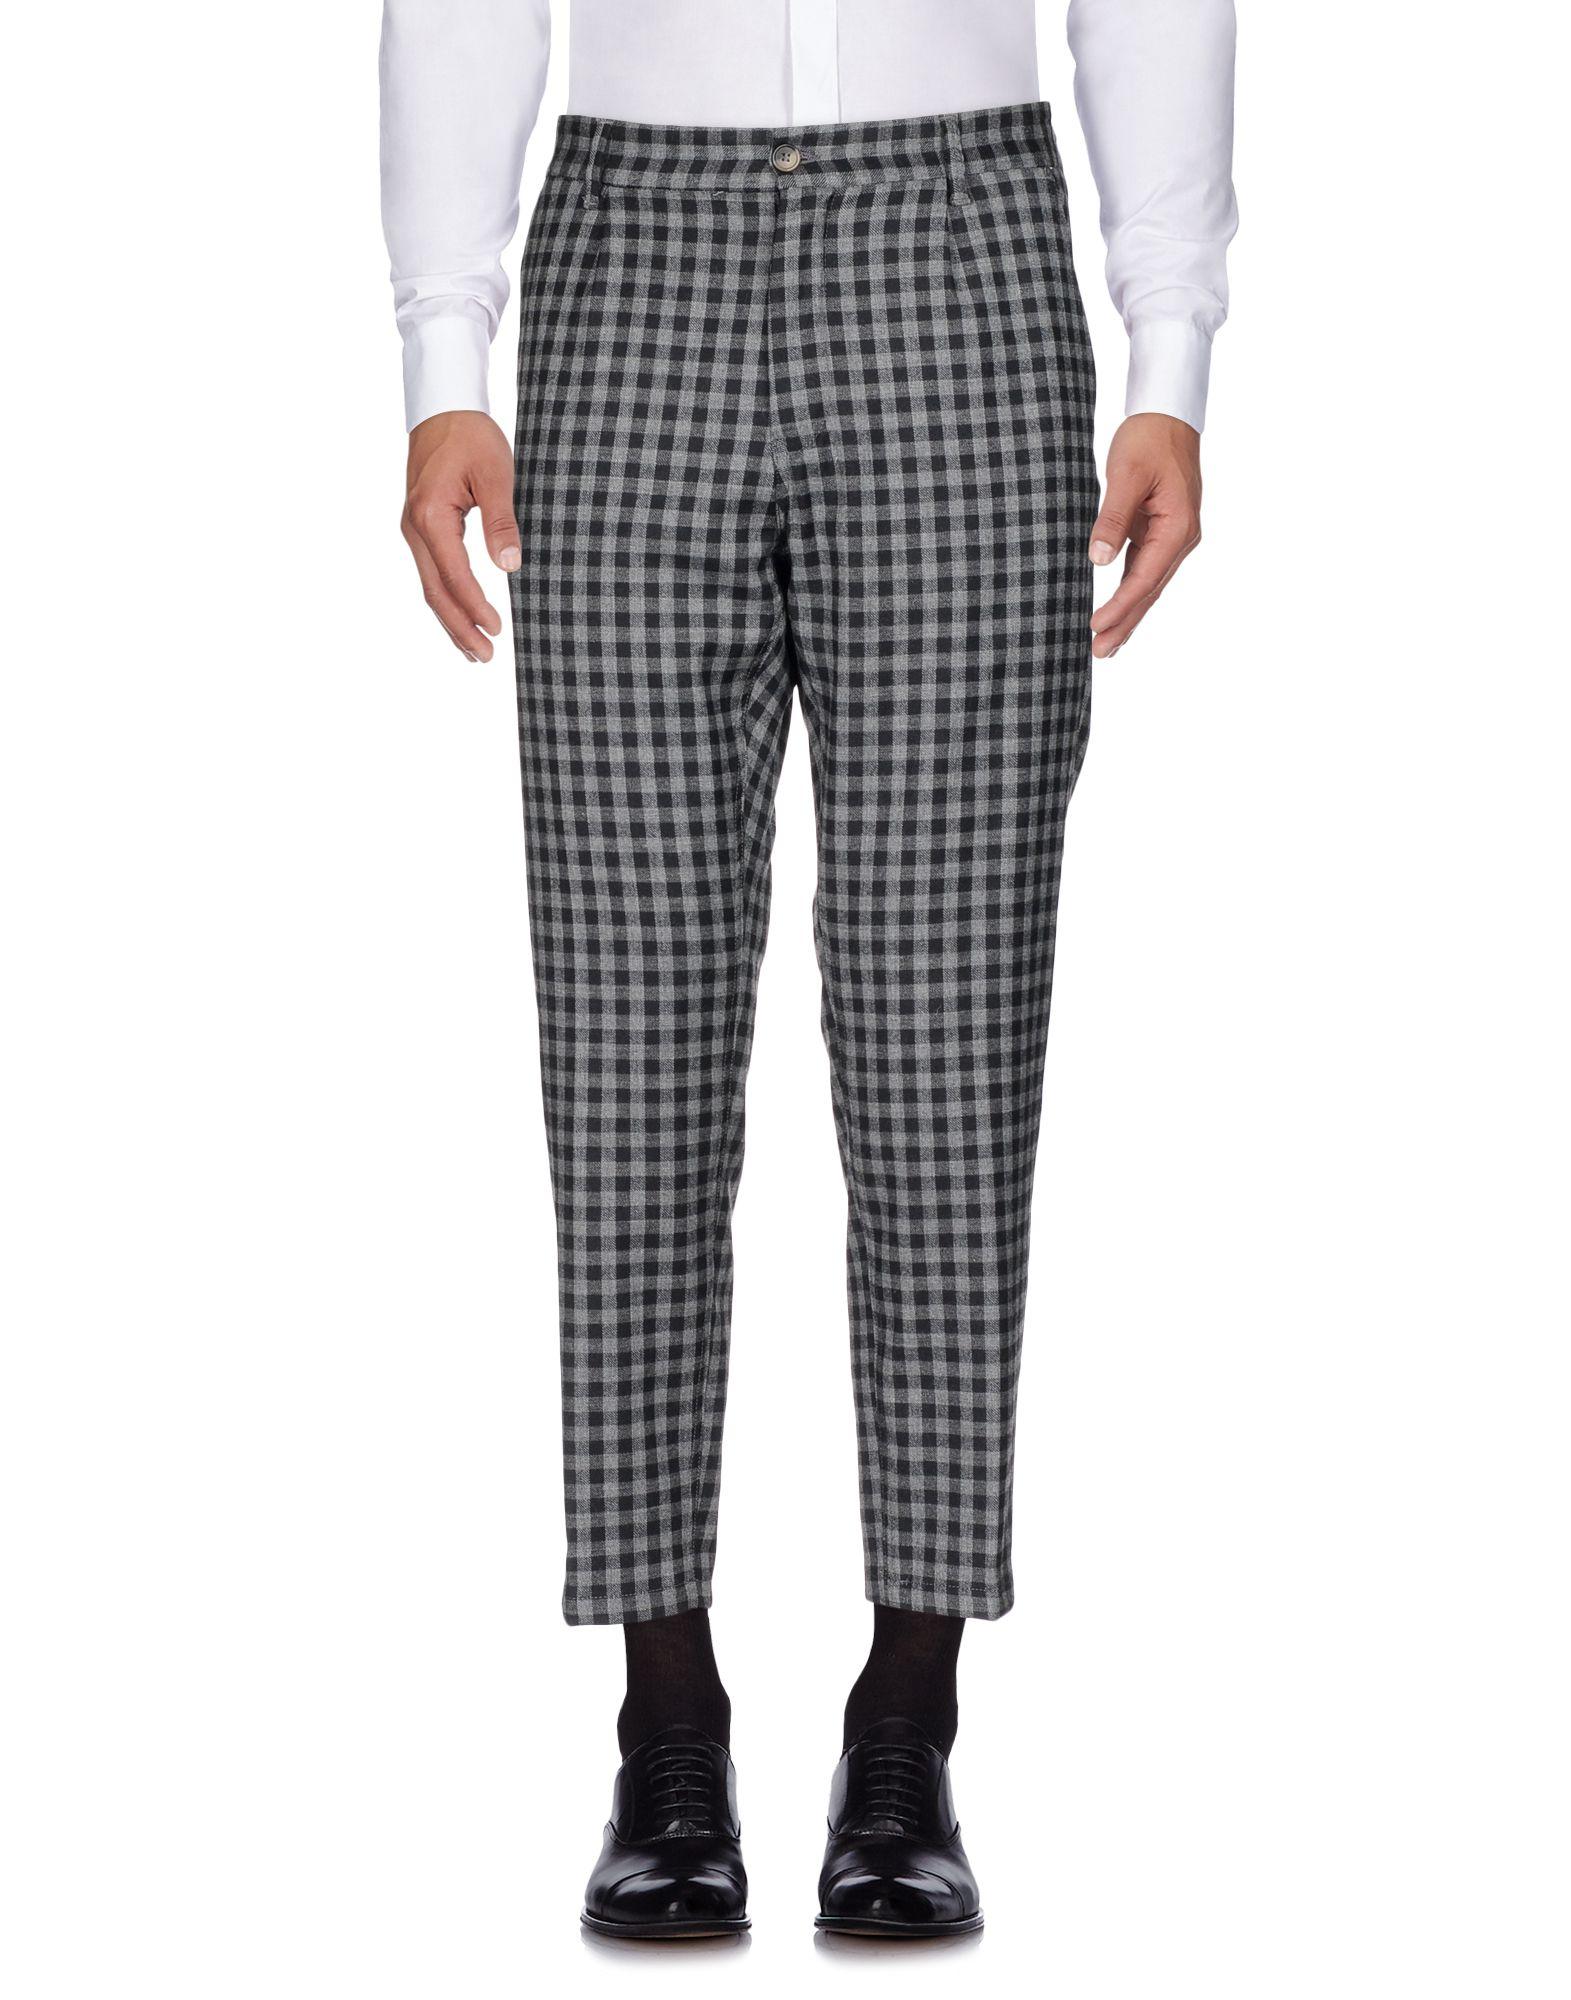 Pantalone Haikure Donna - Acquista online su